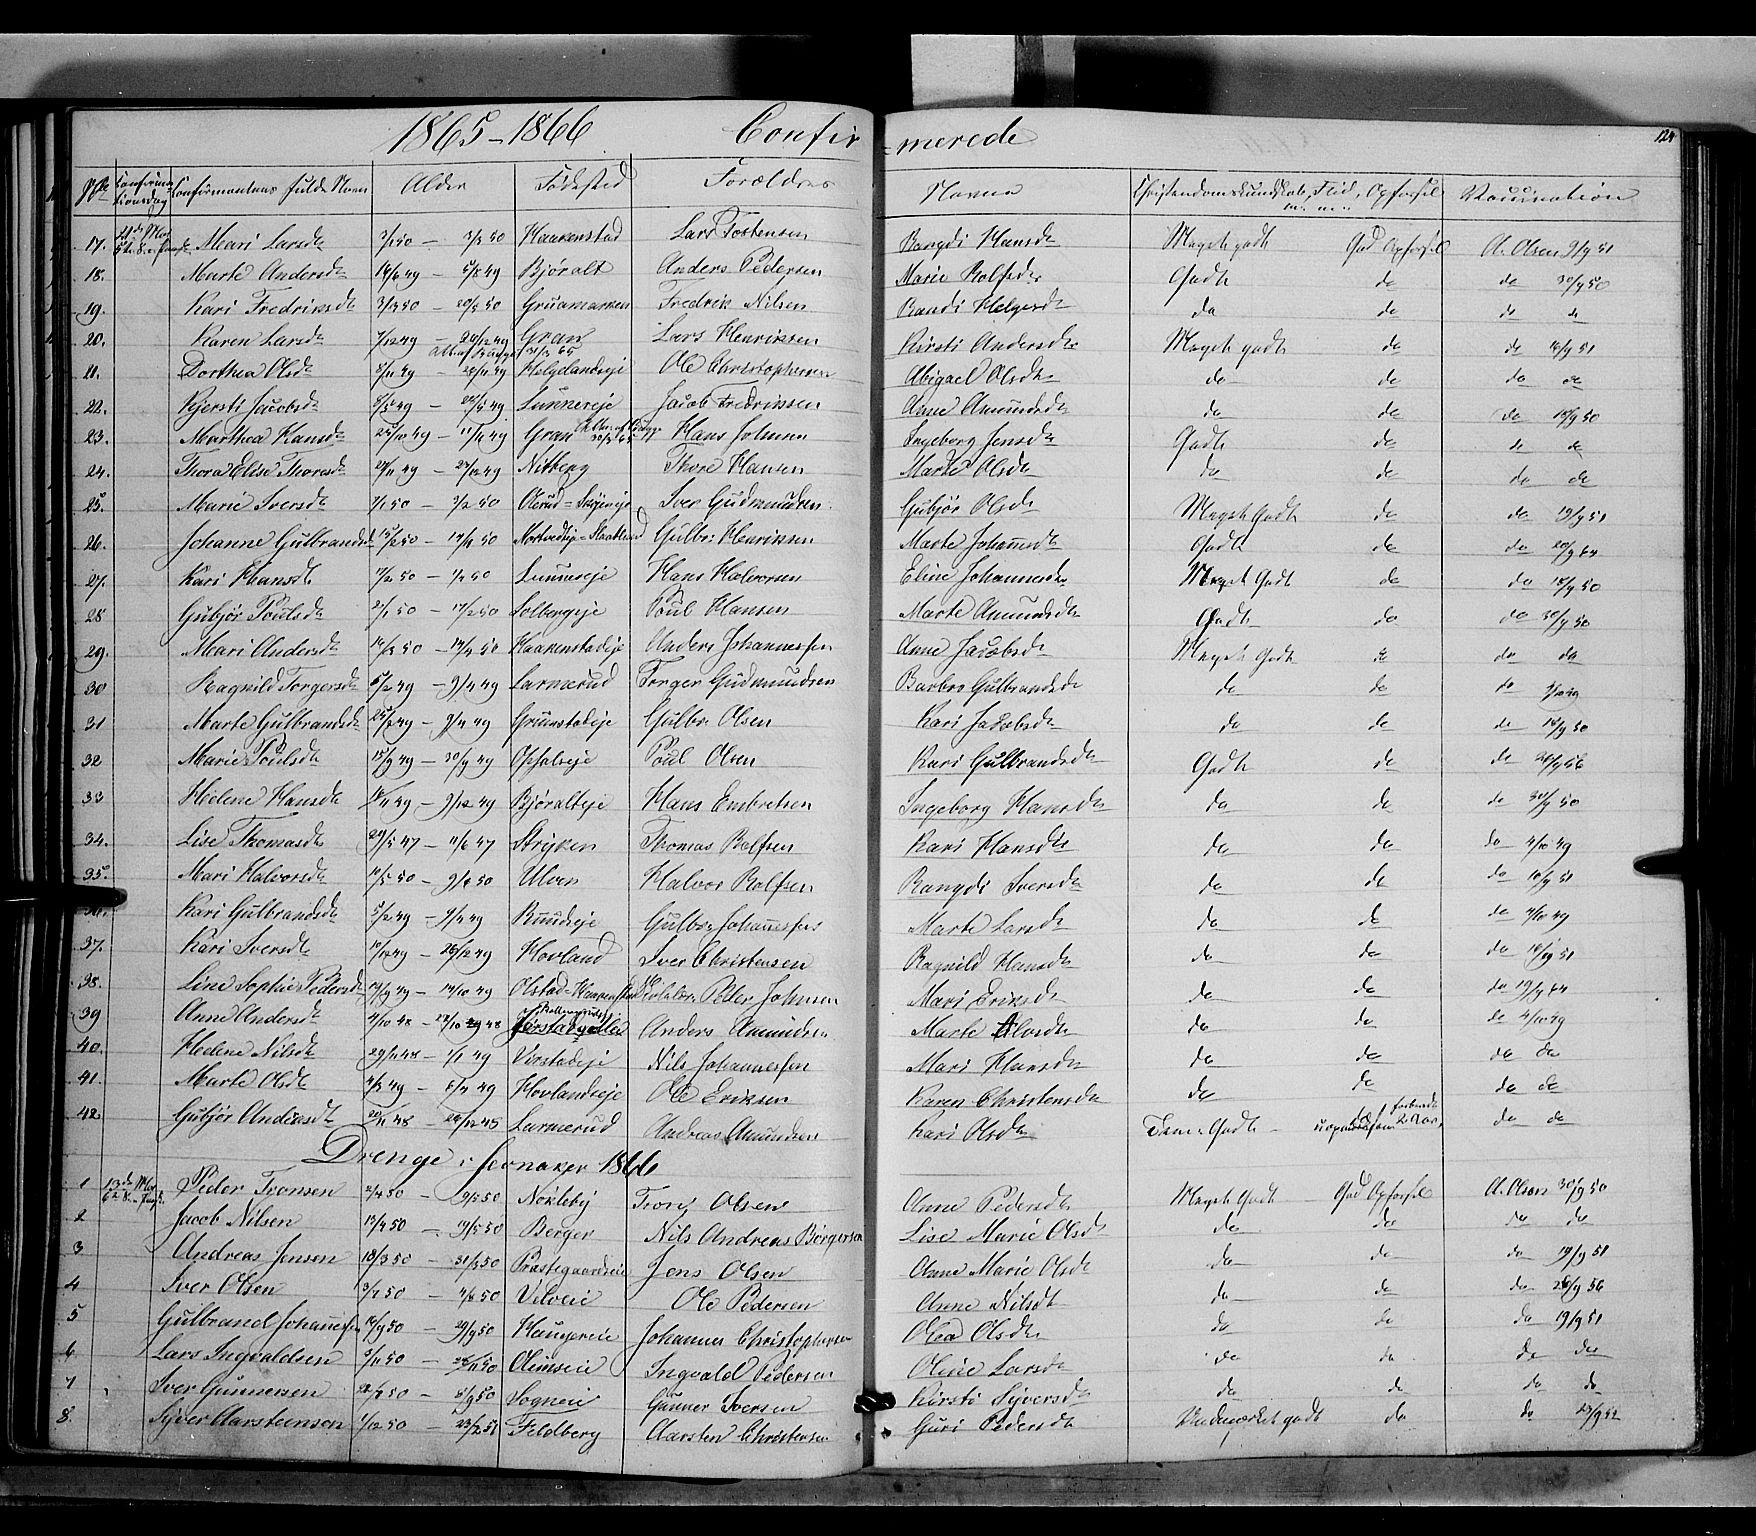 SAH, Jevnaker prestekontor, Ministerialbok nr. 7, 1858-1876, s. 124